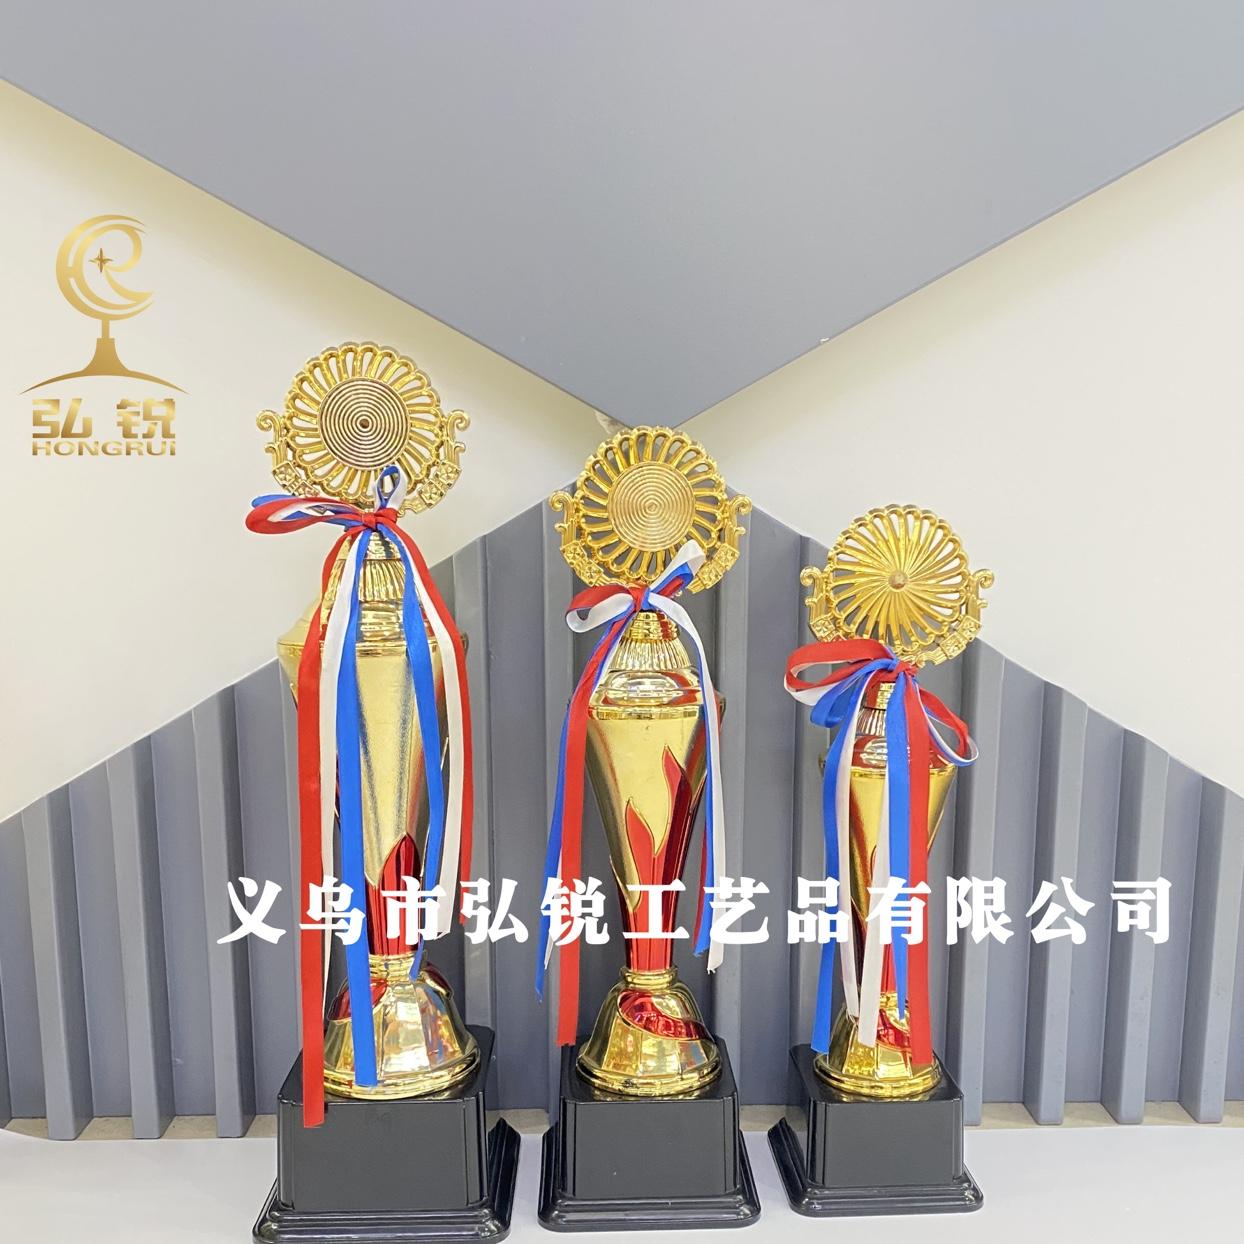 HR-158A塑料奖杯43CM比赛活动奖励书画年会奖品可创意定制logo